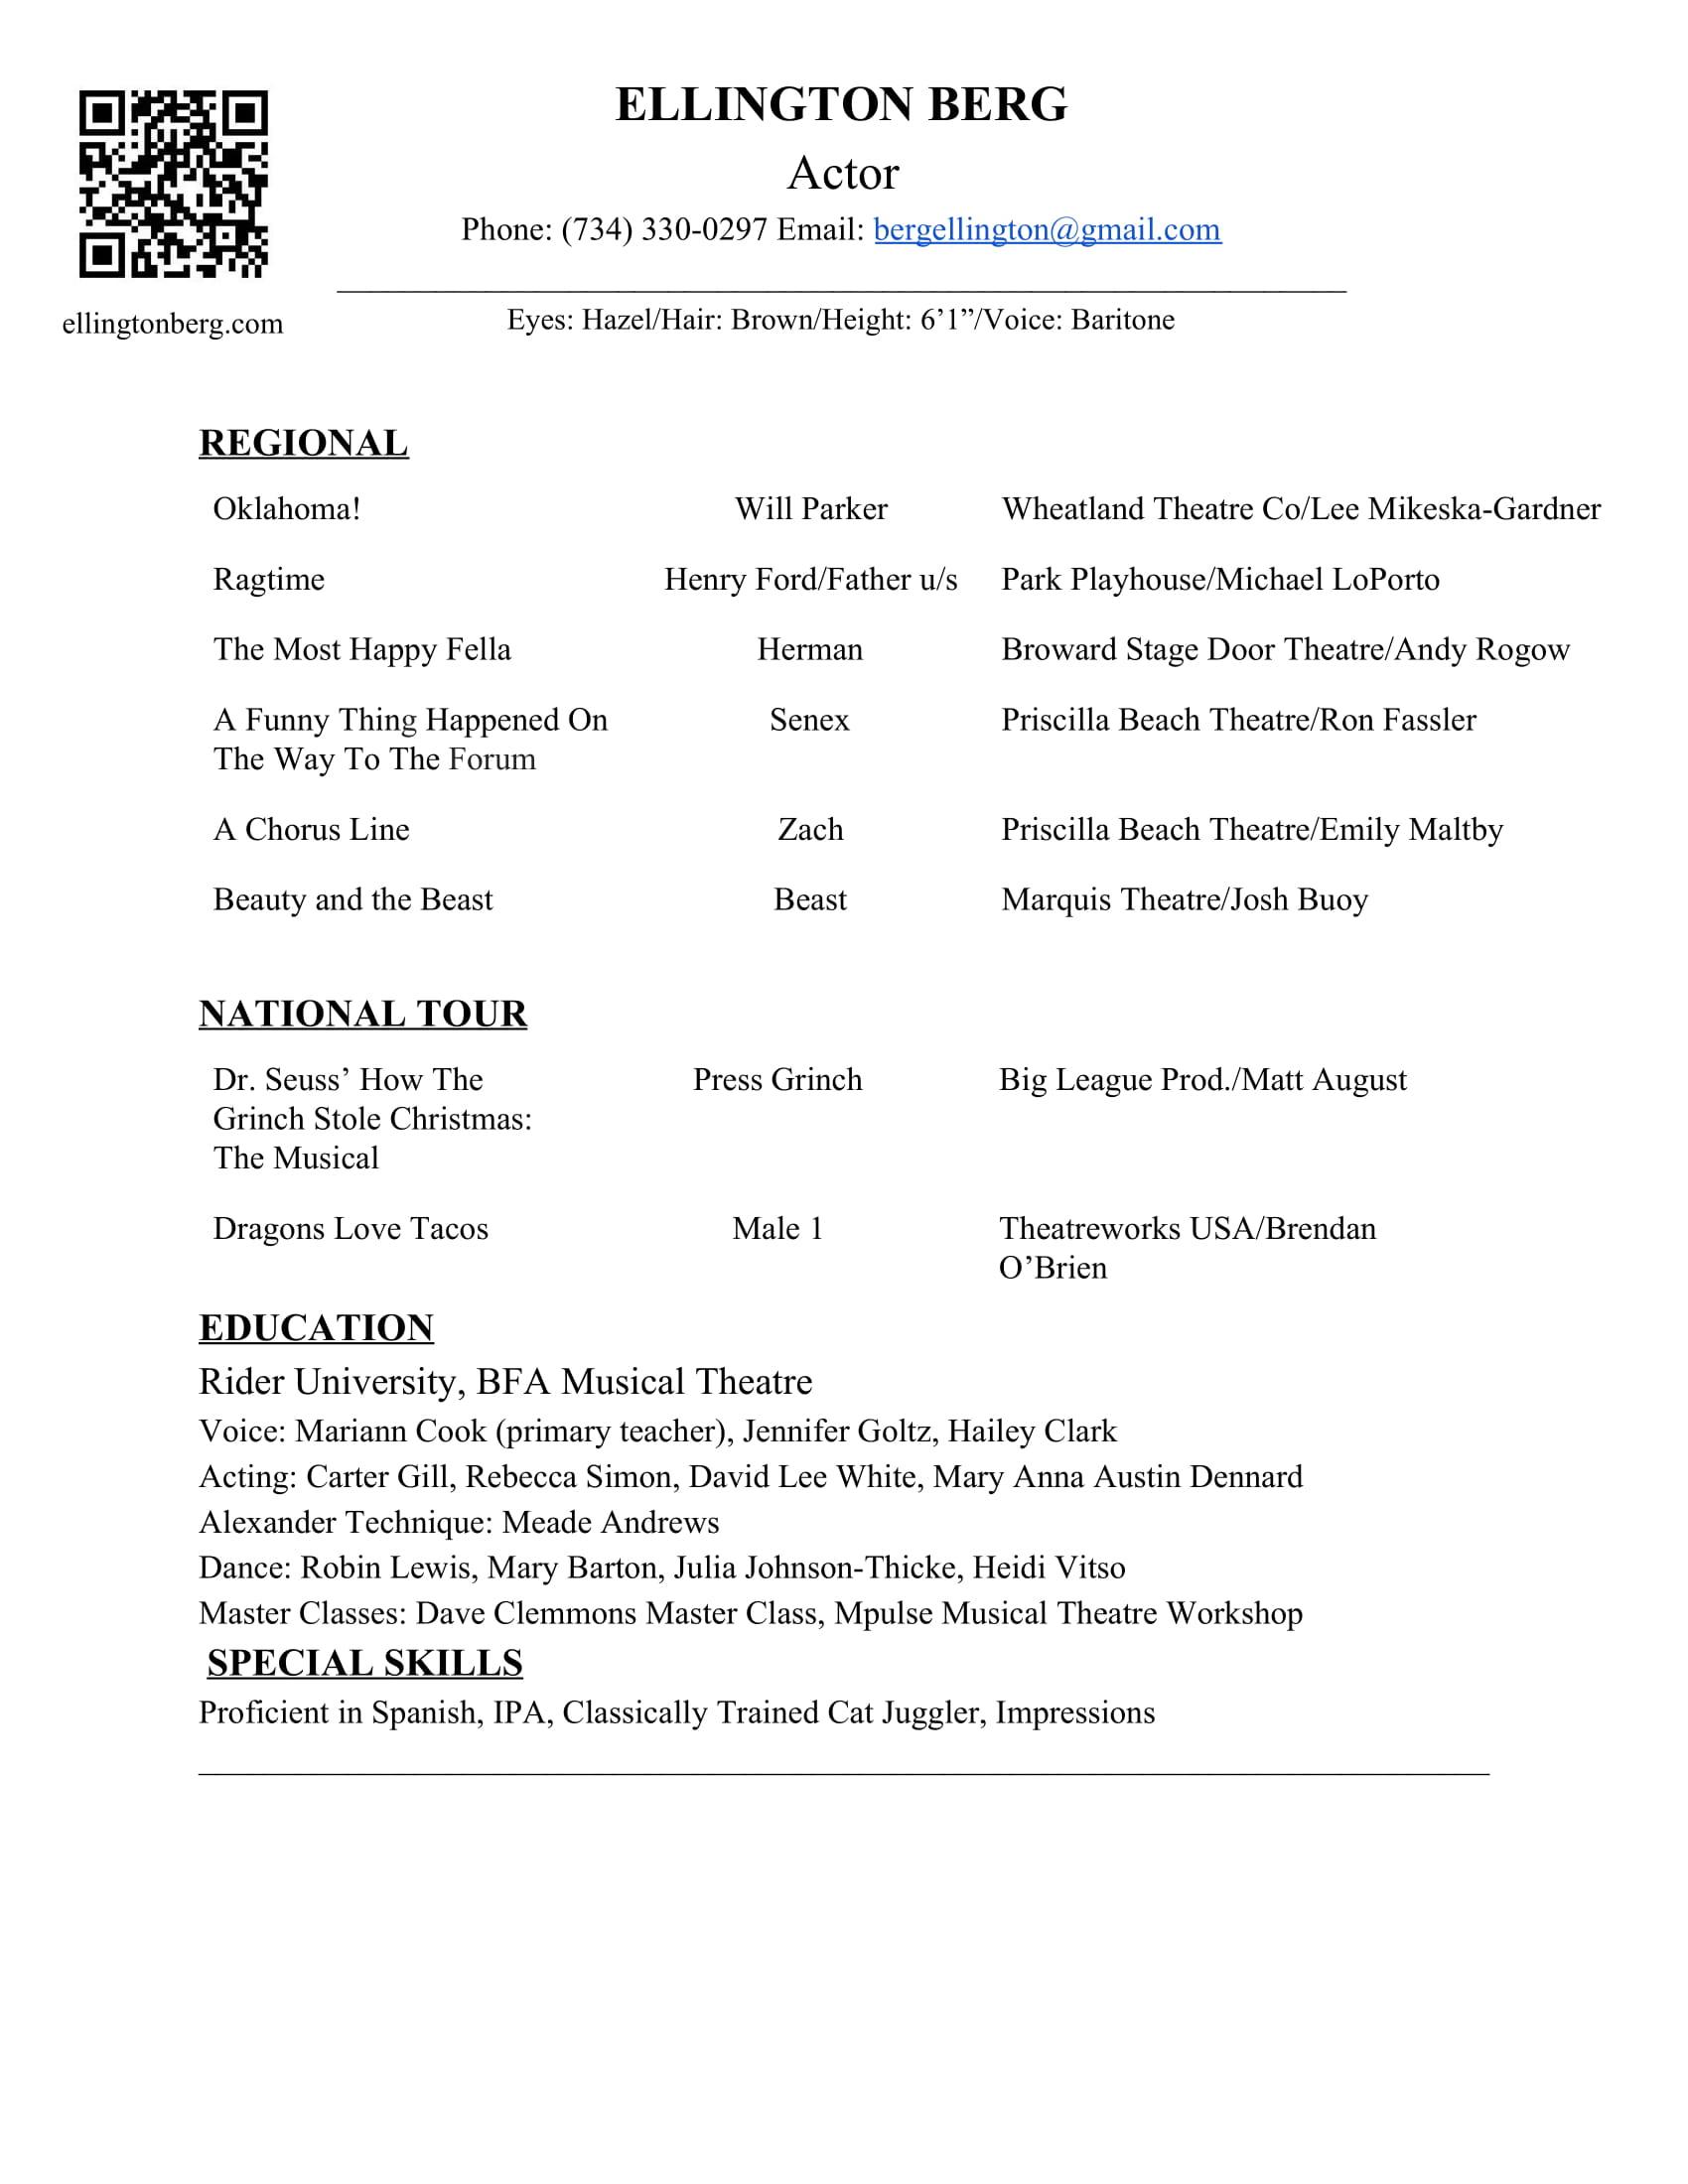 Ellington Berg Performance Resume-1.jpg